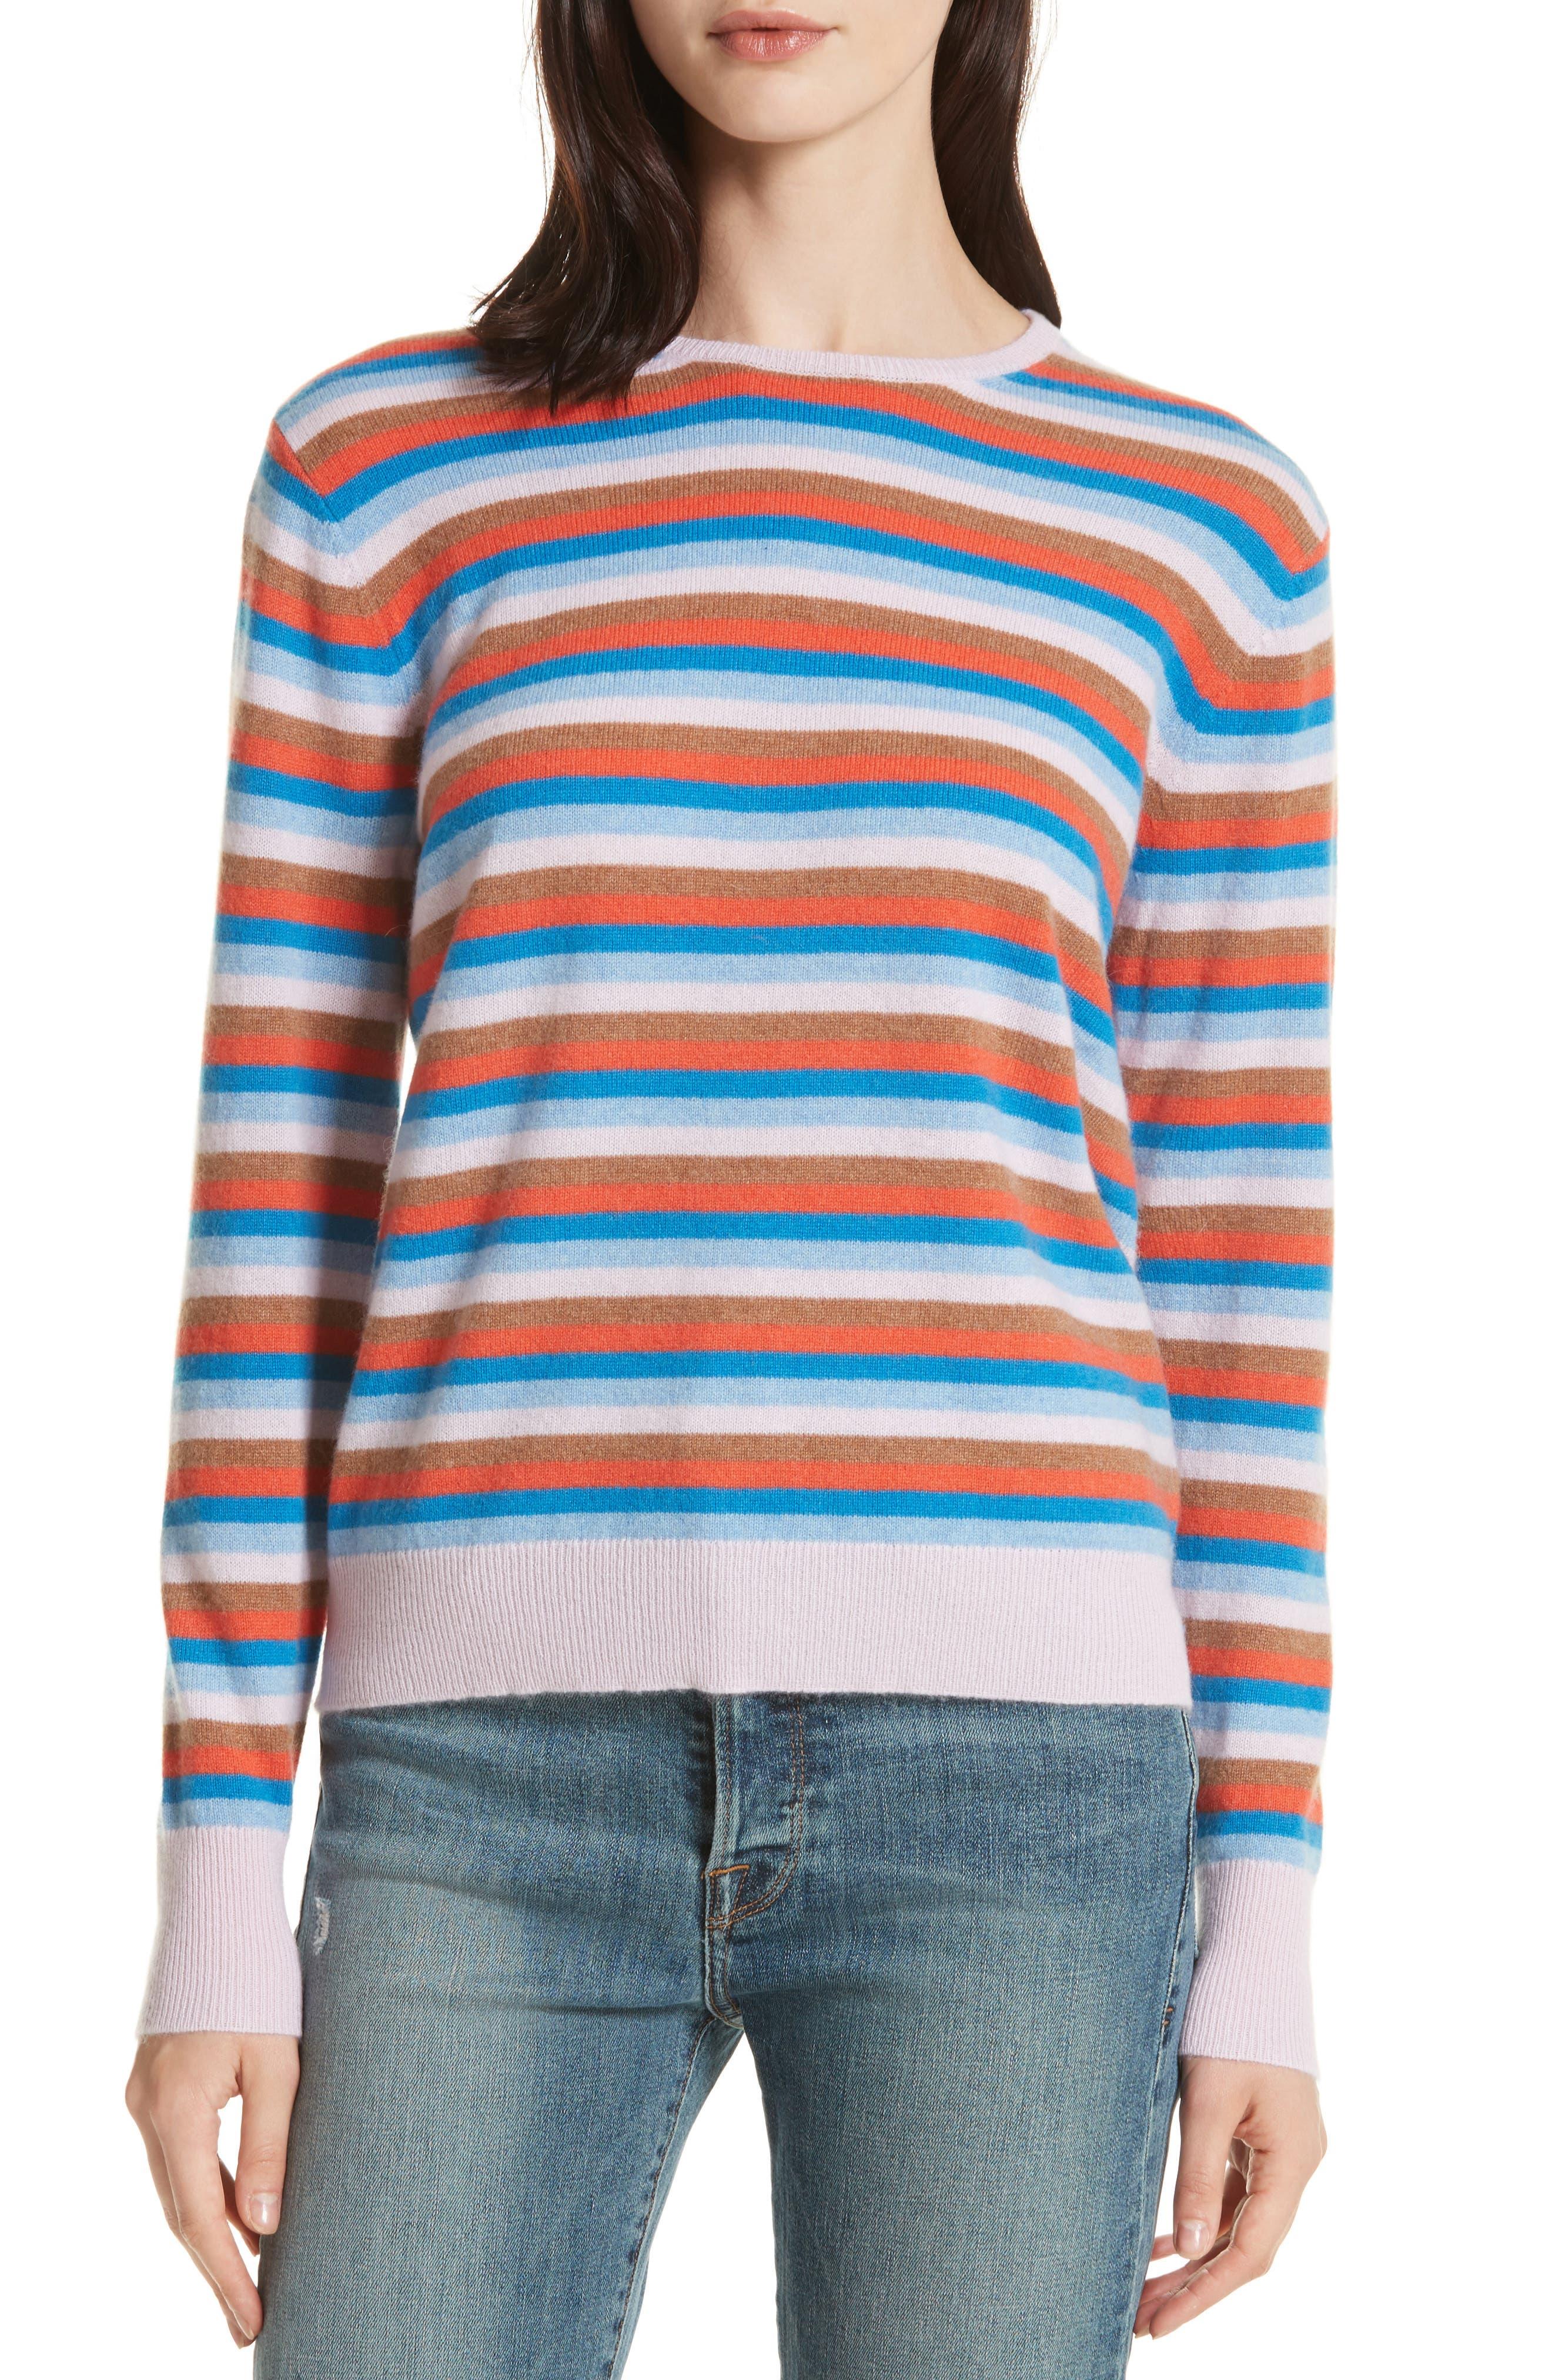 Main Image - Kule The Raven Cashmere Sweater